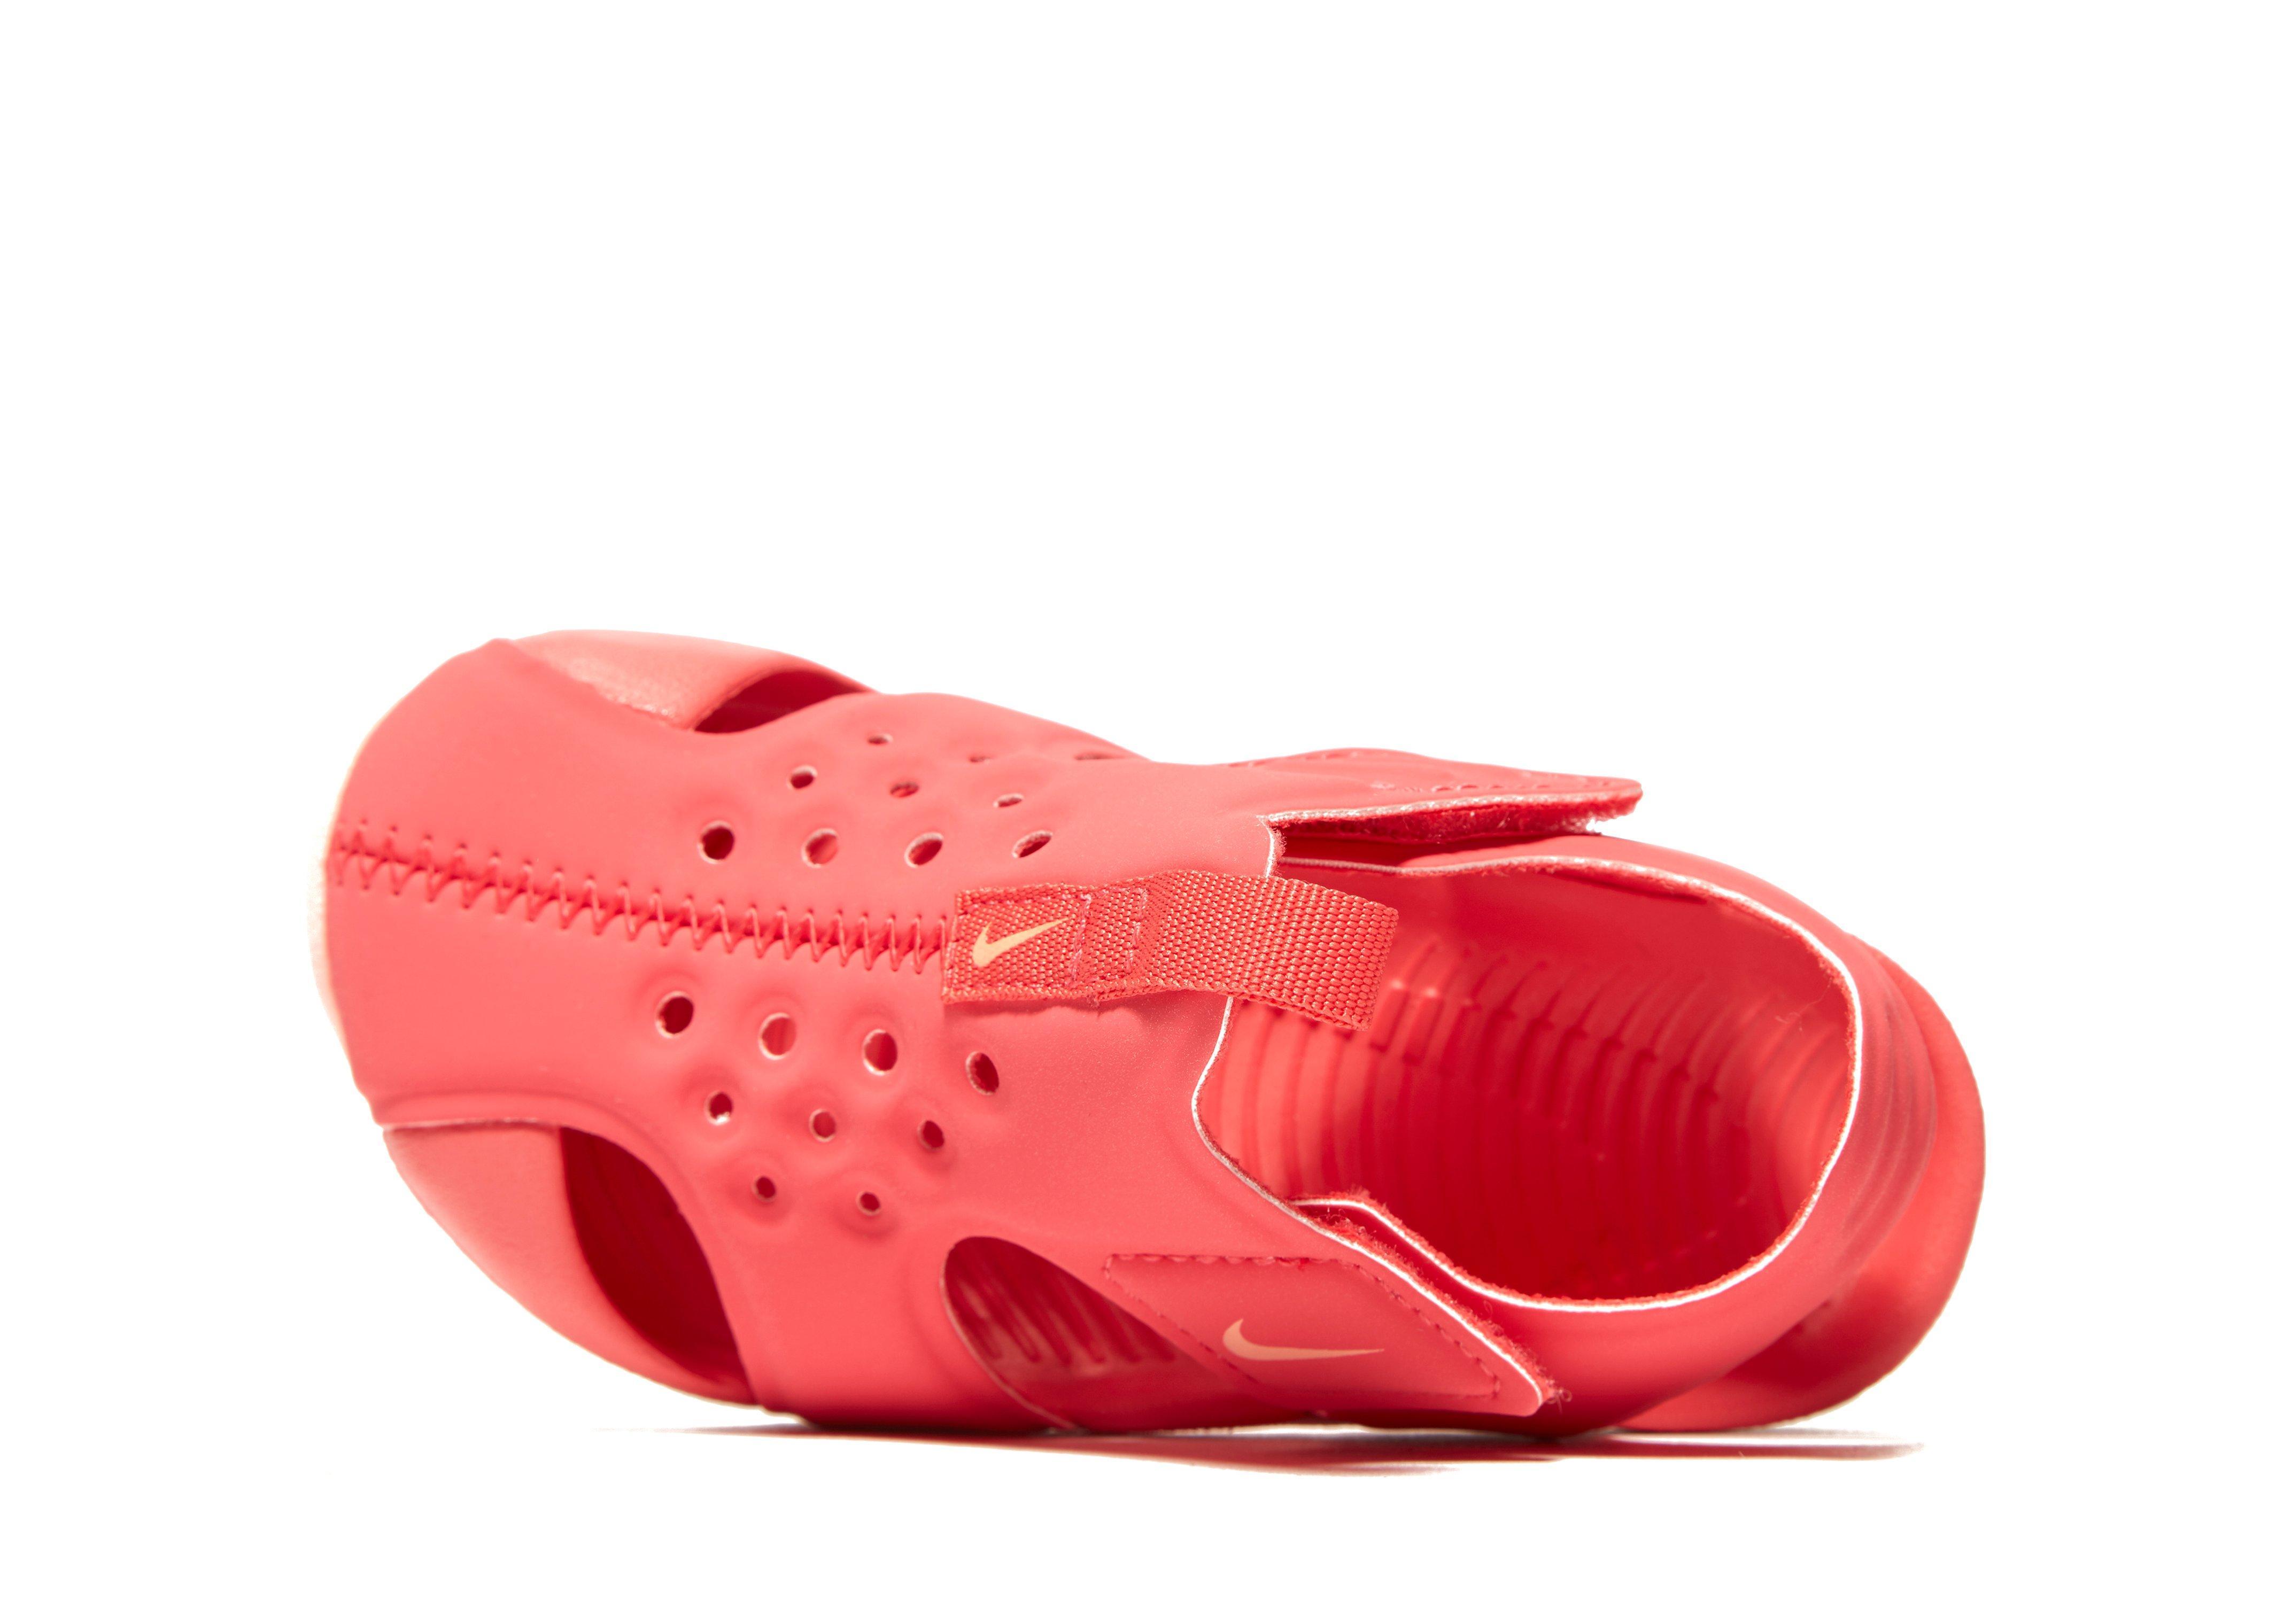 5c368dff66da2 Jual Nike Free 4.0 Black Kids Shoes